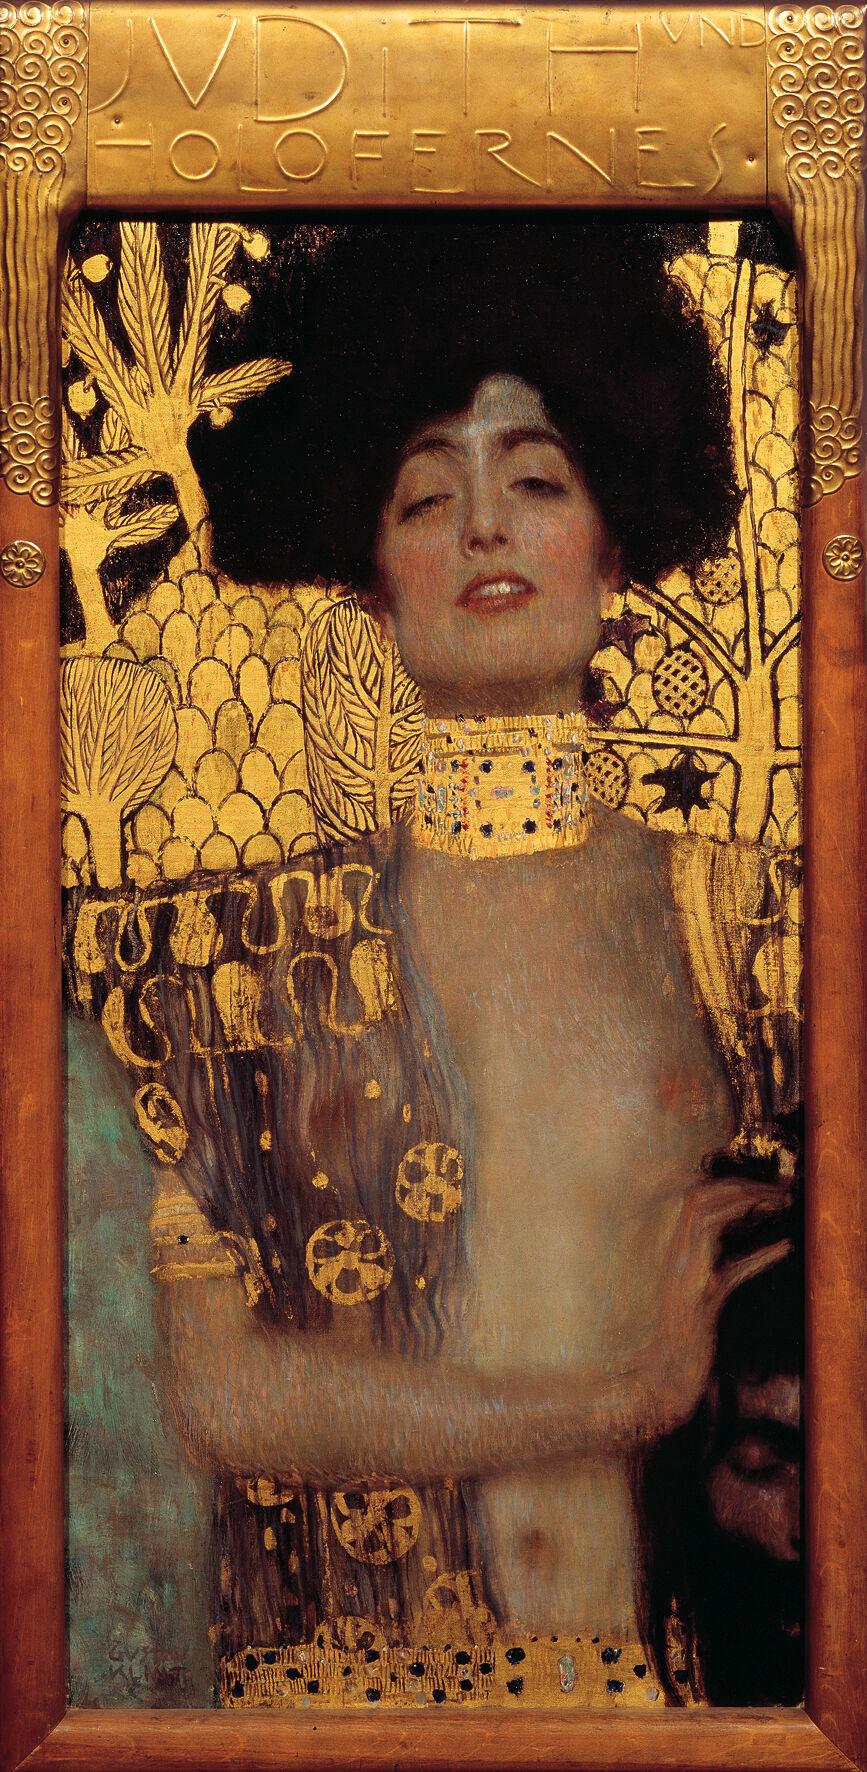 Gustav Klimt, Judith I, 1901. Image via Wikimedia Commons.